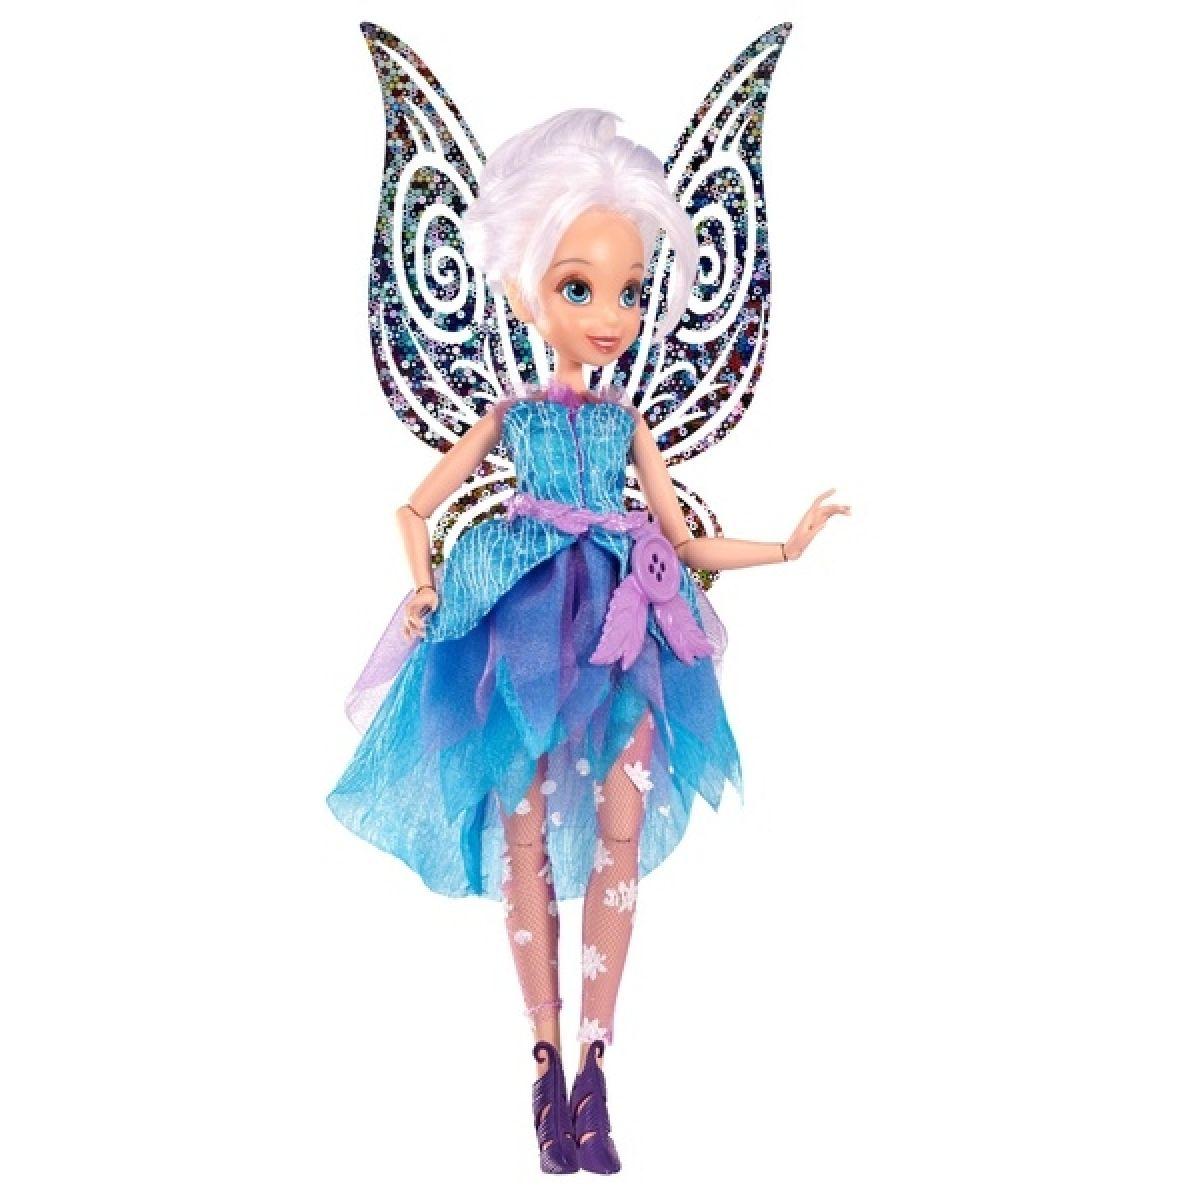 Disney Fairy 22cm Deluxe modní panenka - Periwinkle